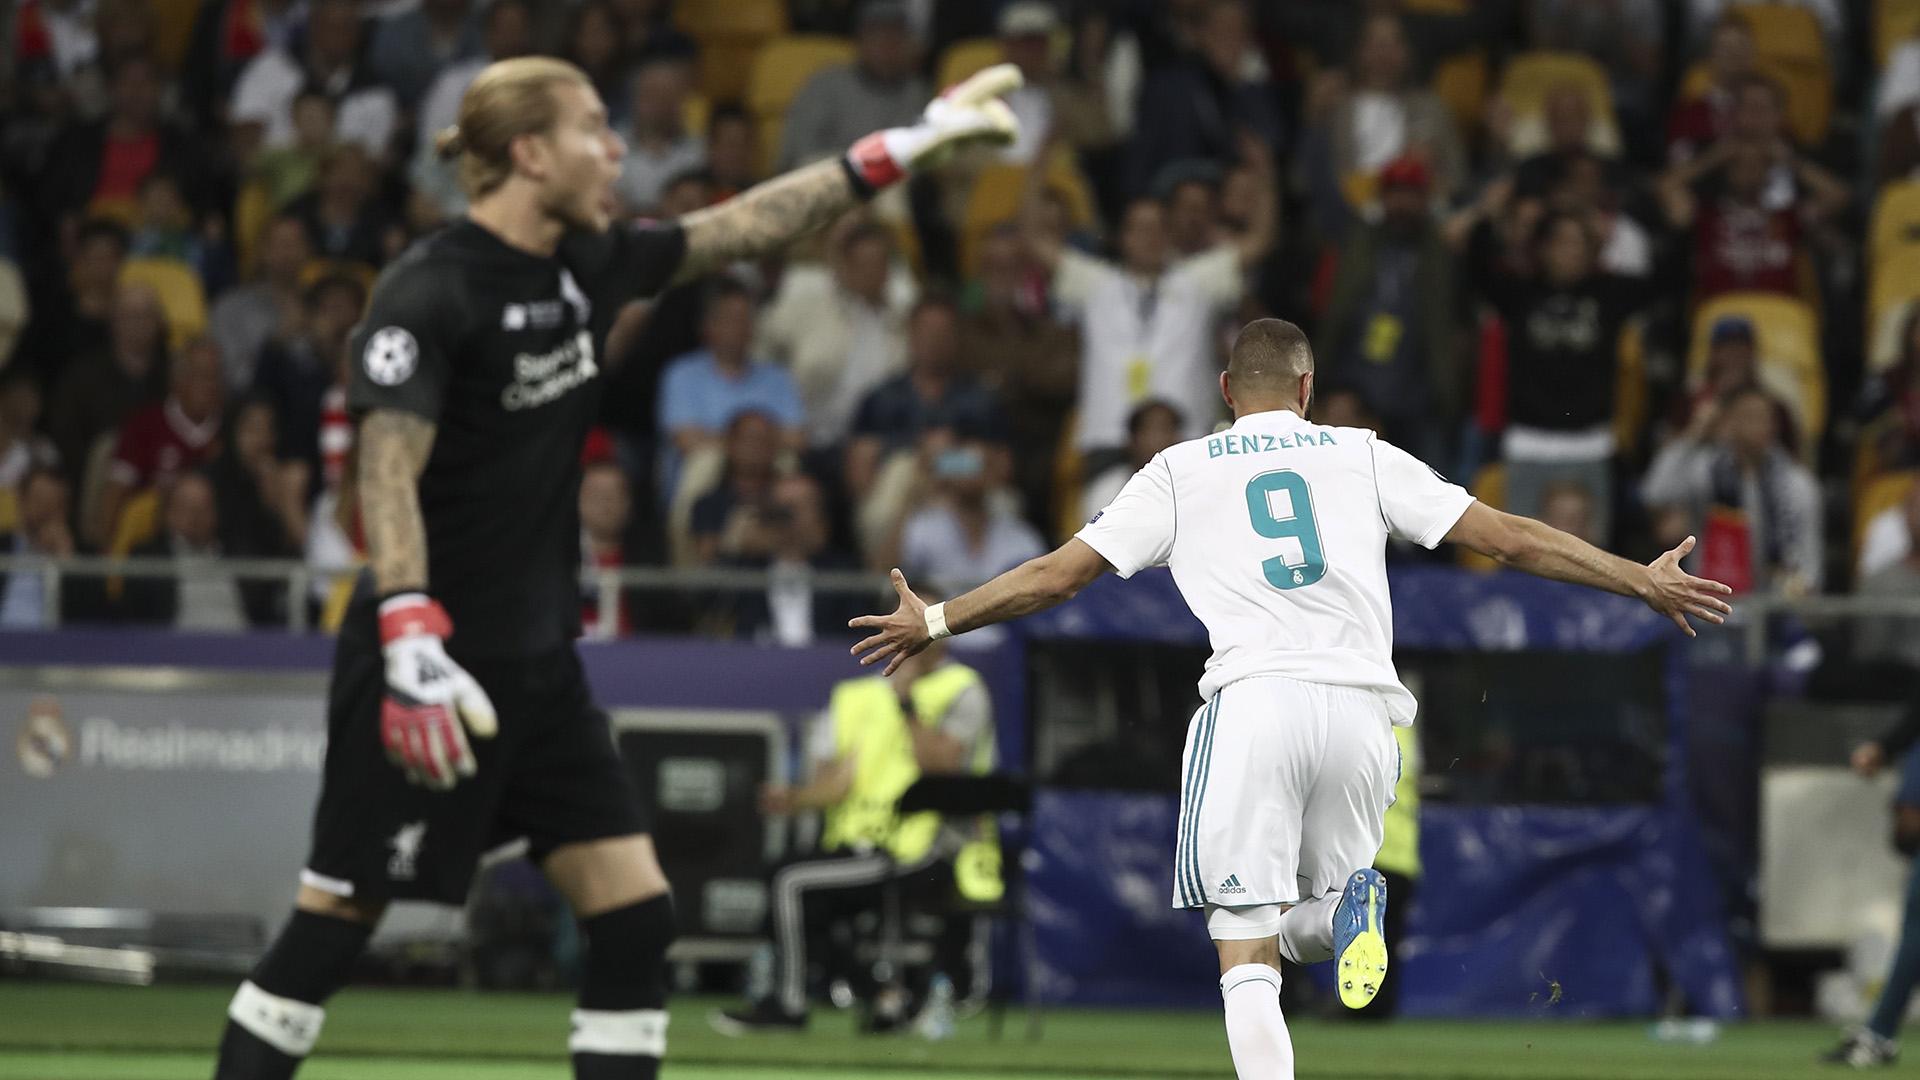 Benzema goal Karius Real Madrid Liverpool Champions League final 26052018